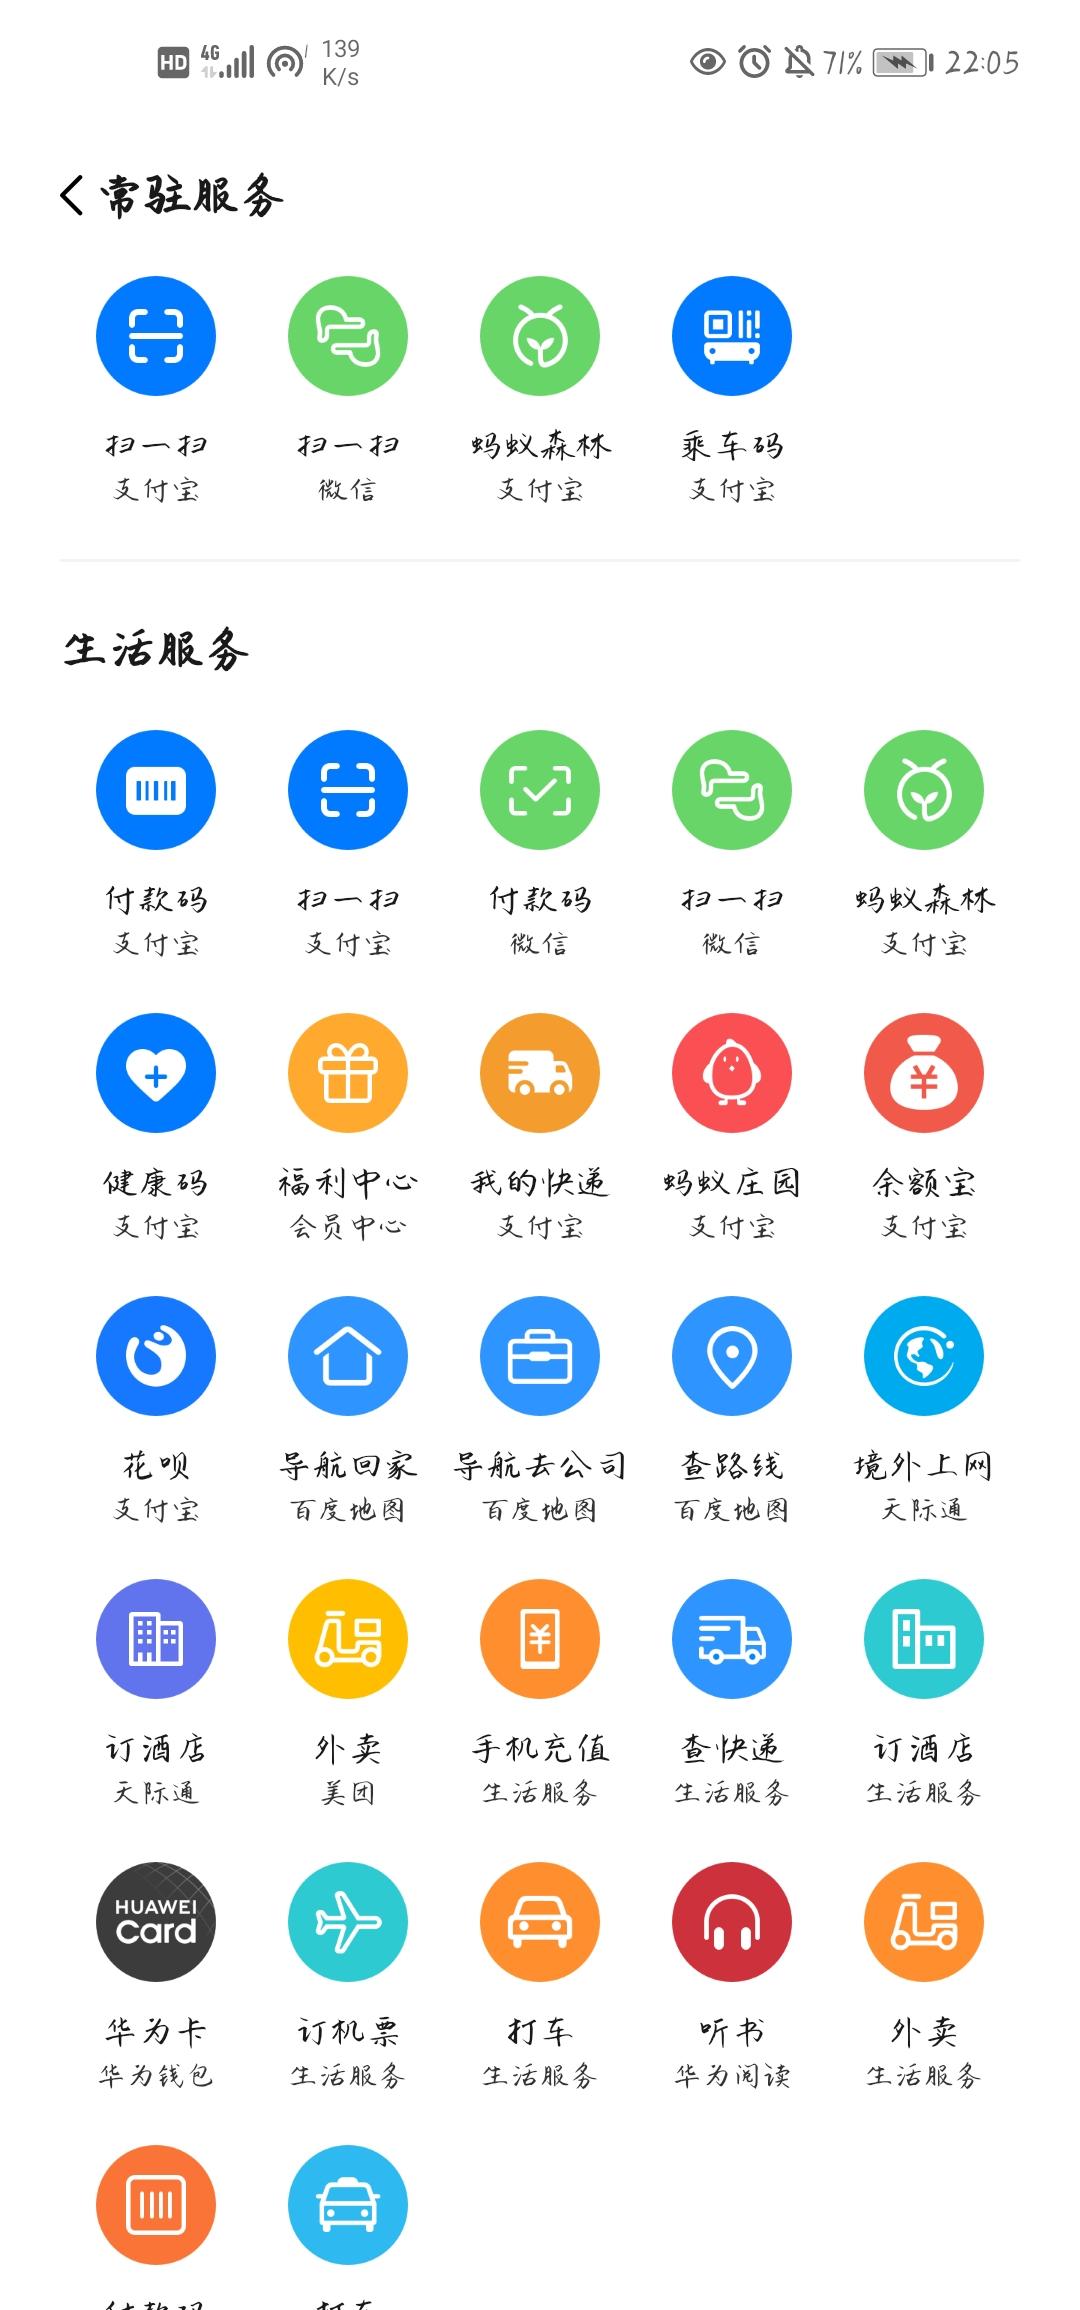 Screenshot_20201028_220521_com.huawei.intelligent.jpg